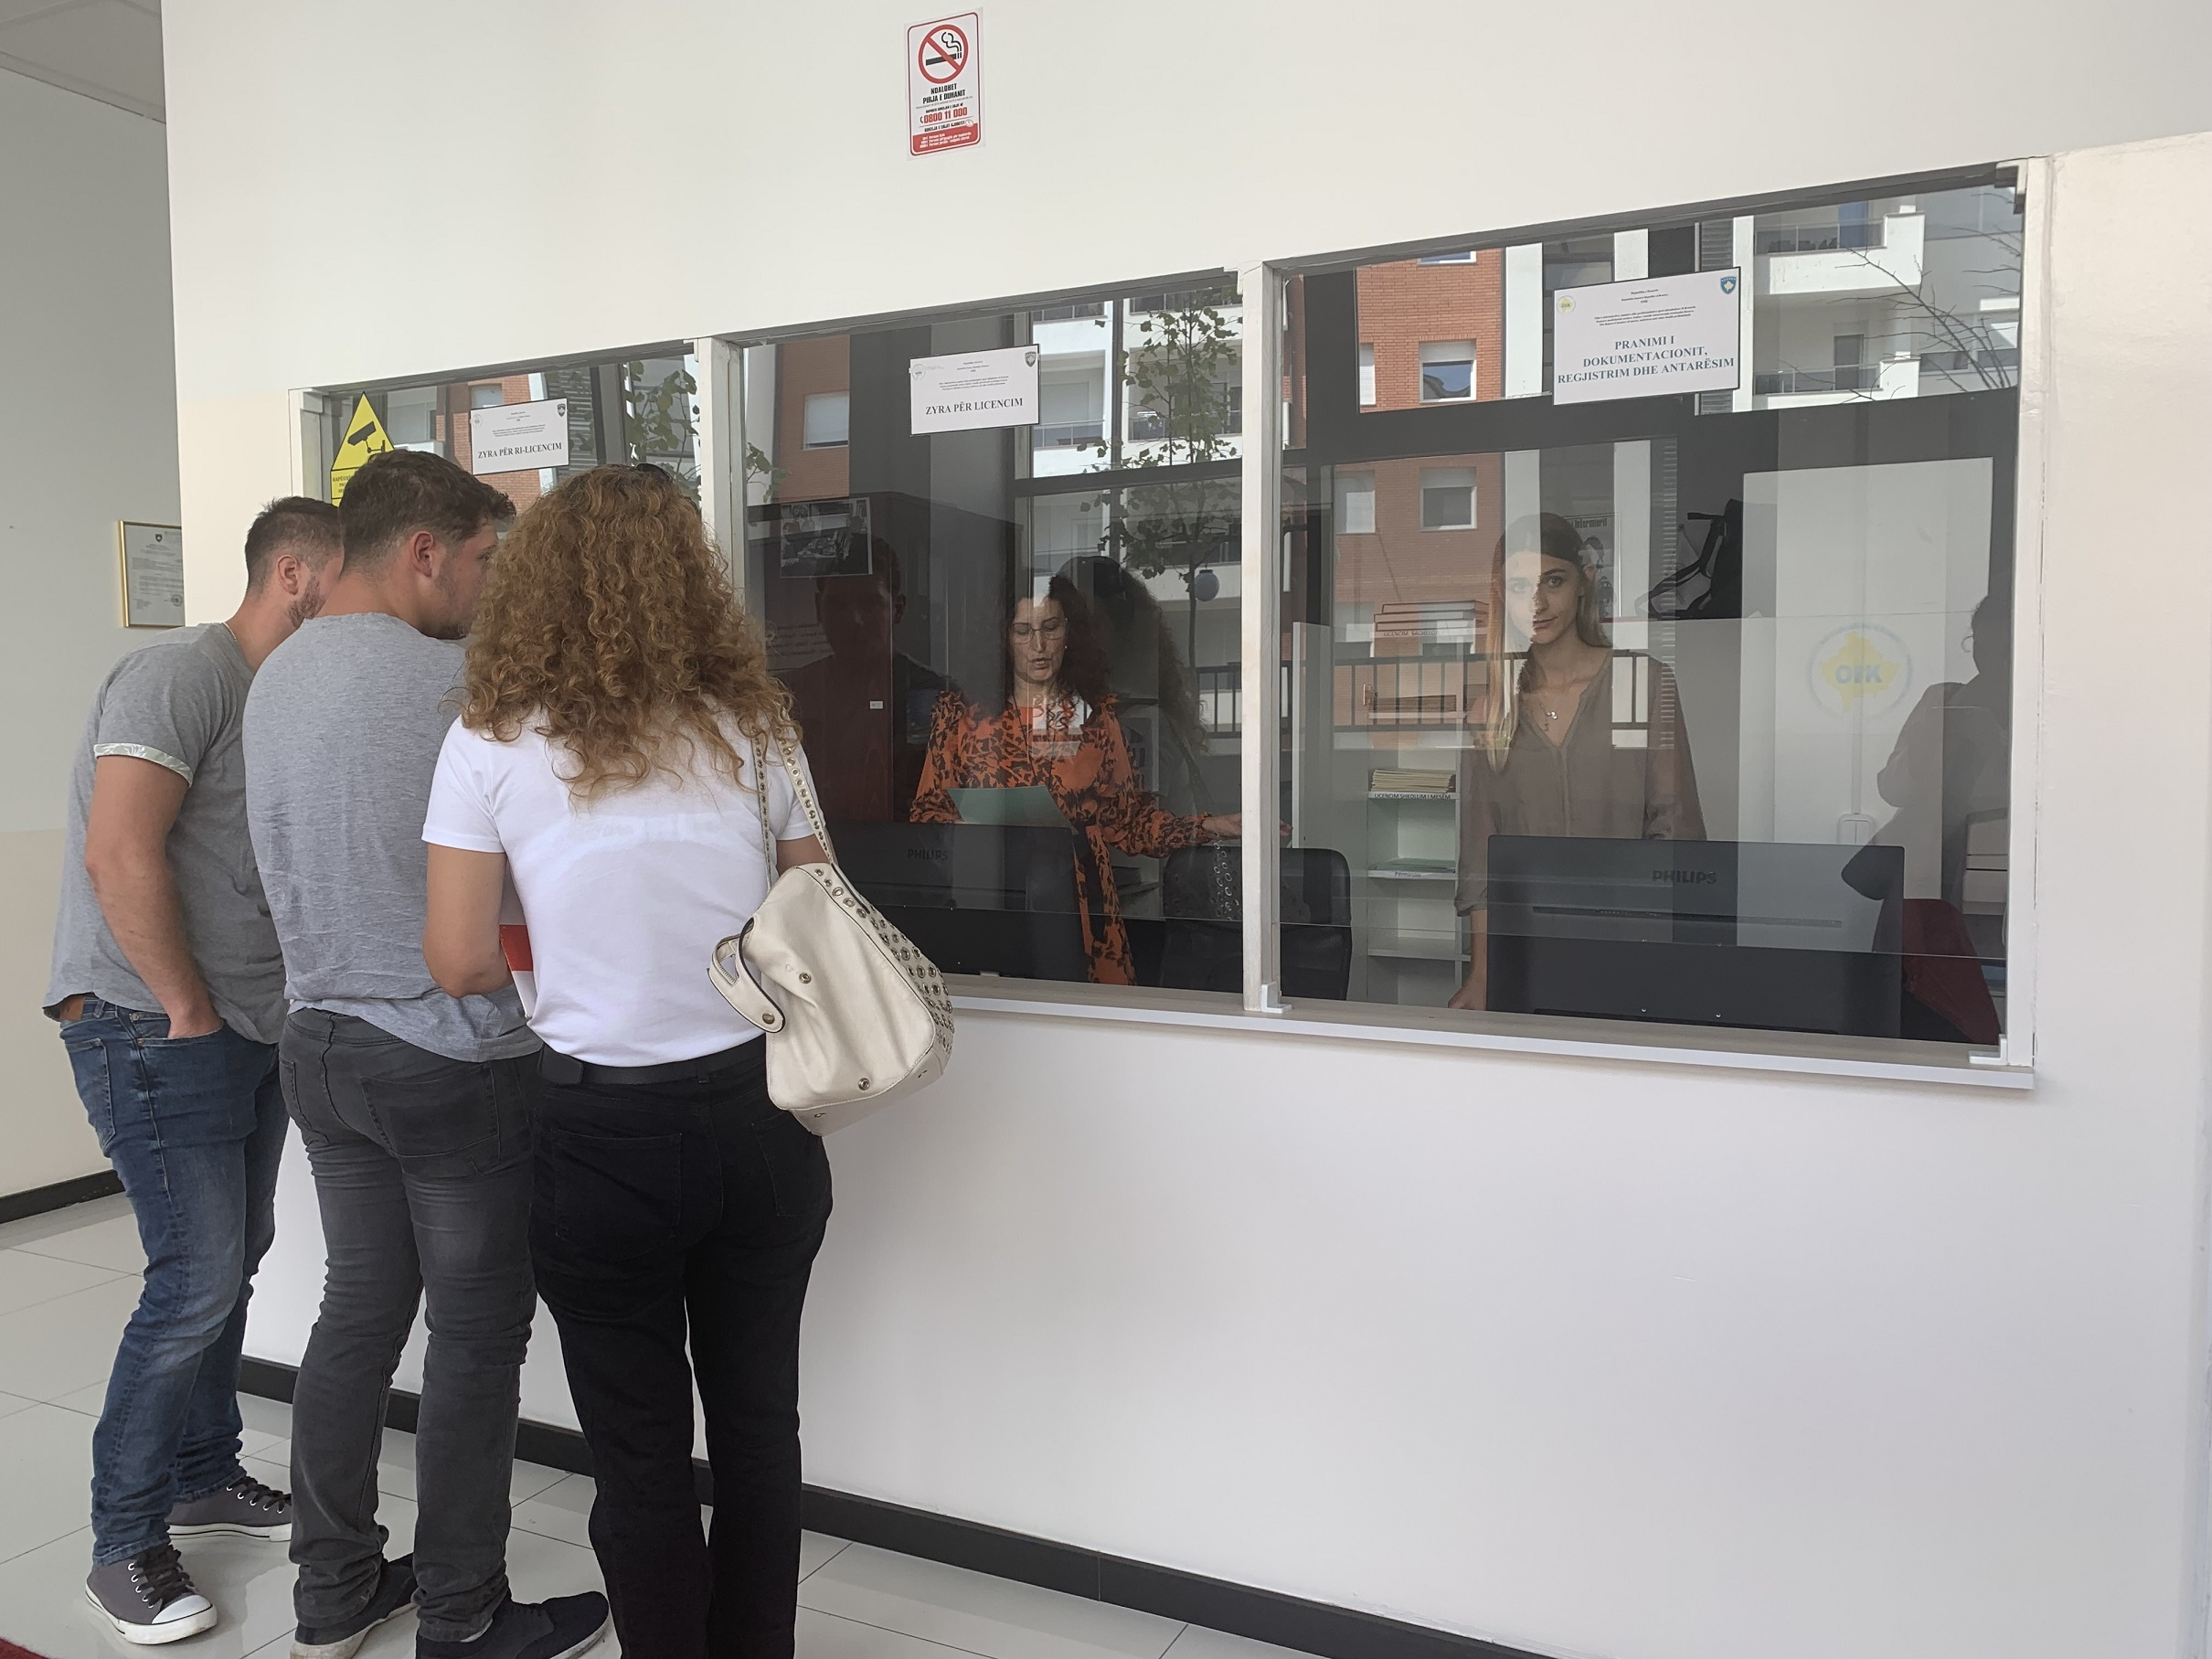 Giovani kosovari chiedono documenti per emigrare